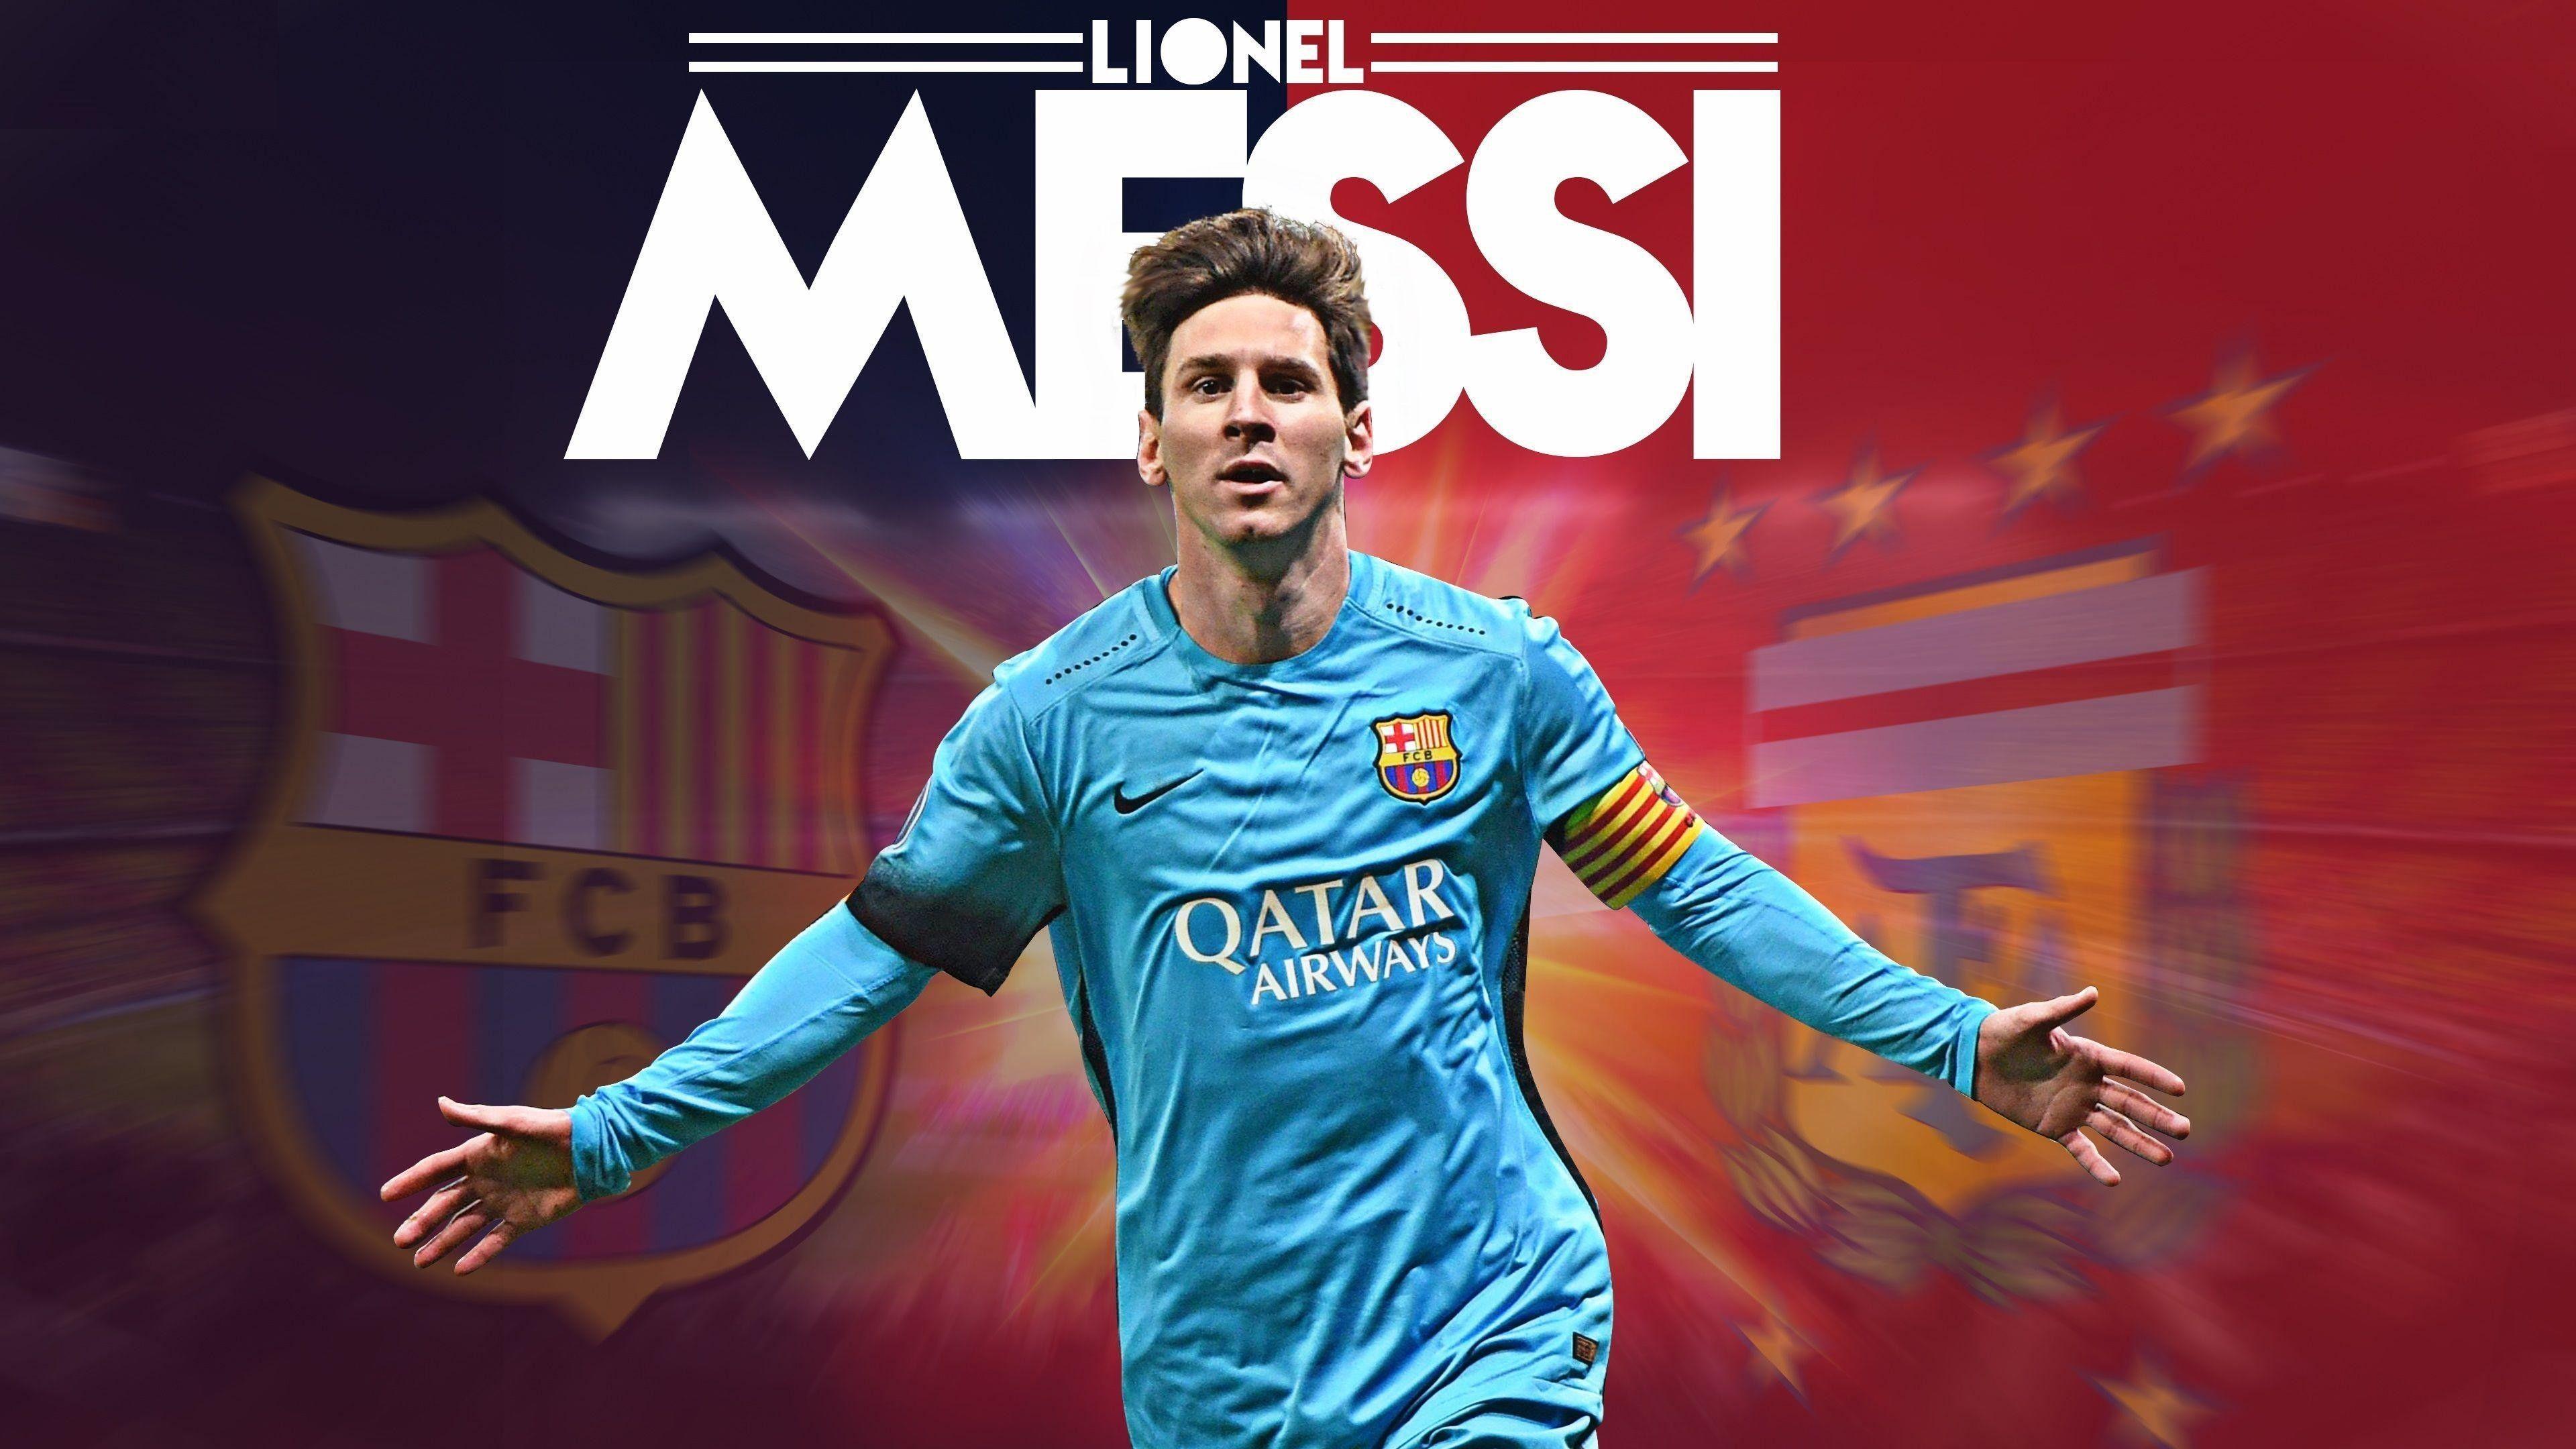 Lionel Messi FCB HD 4K Wallpapers